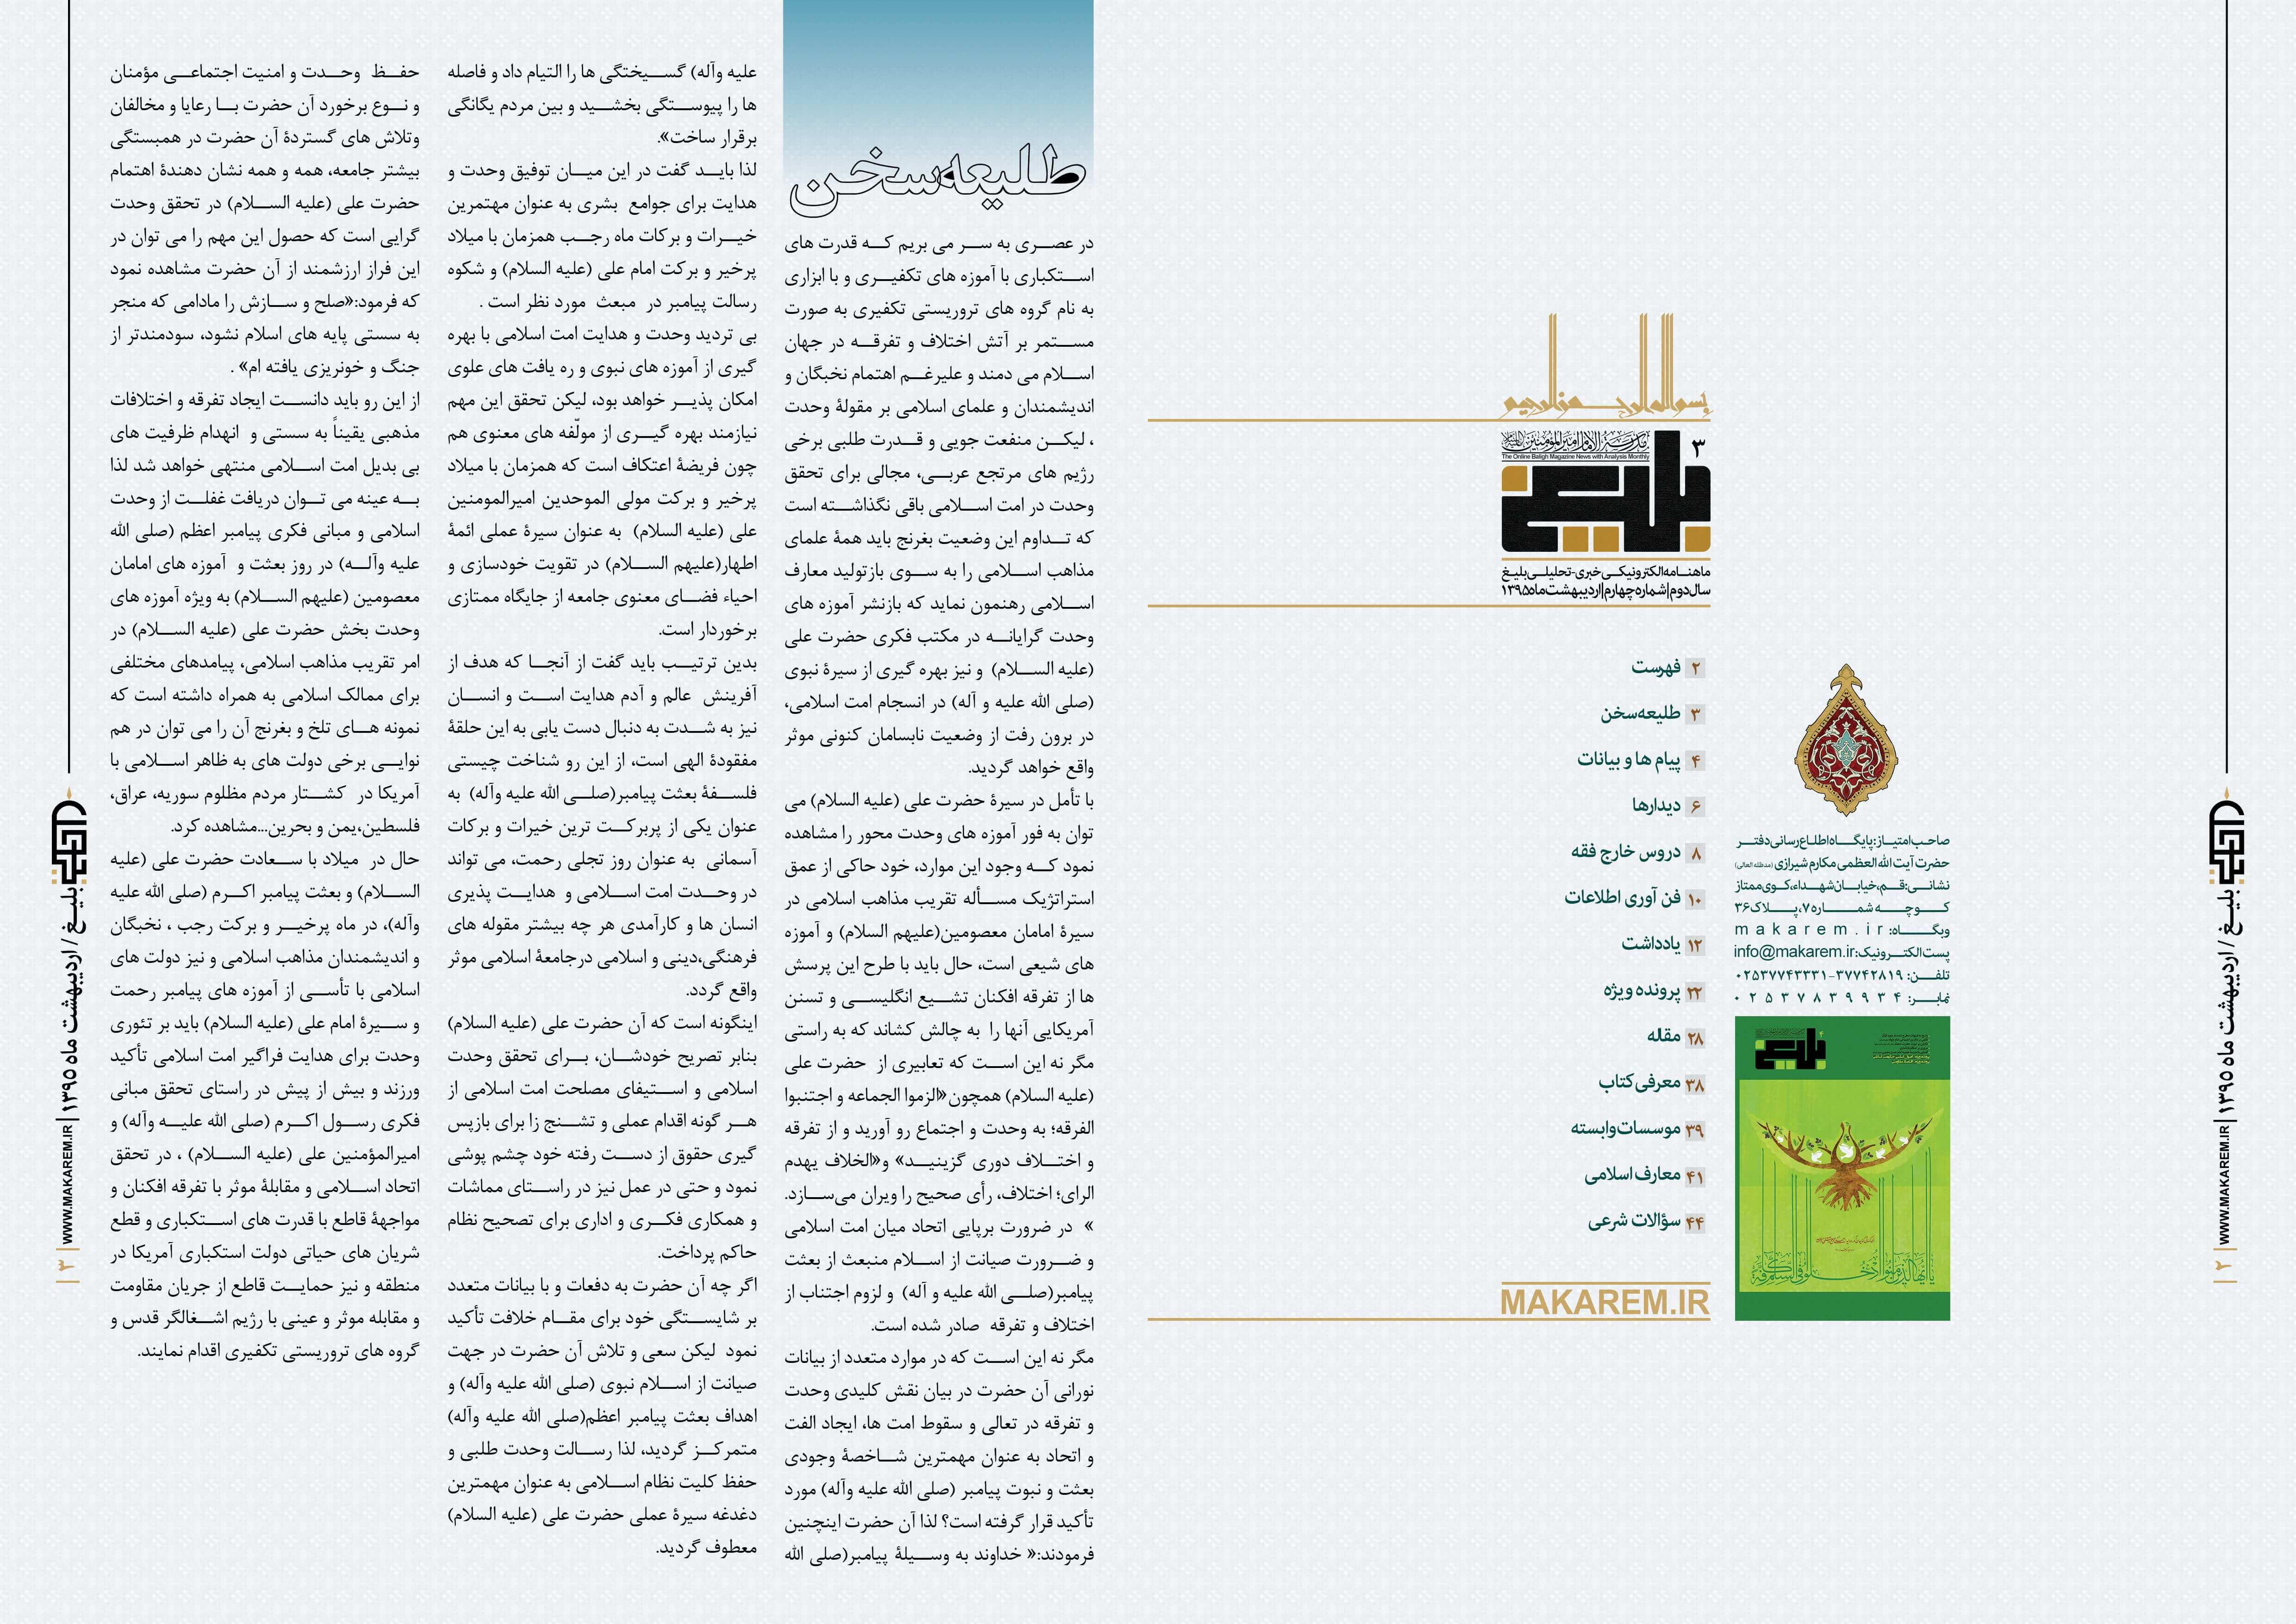 02-مدرسه الامام امیر المومنین (ع)